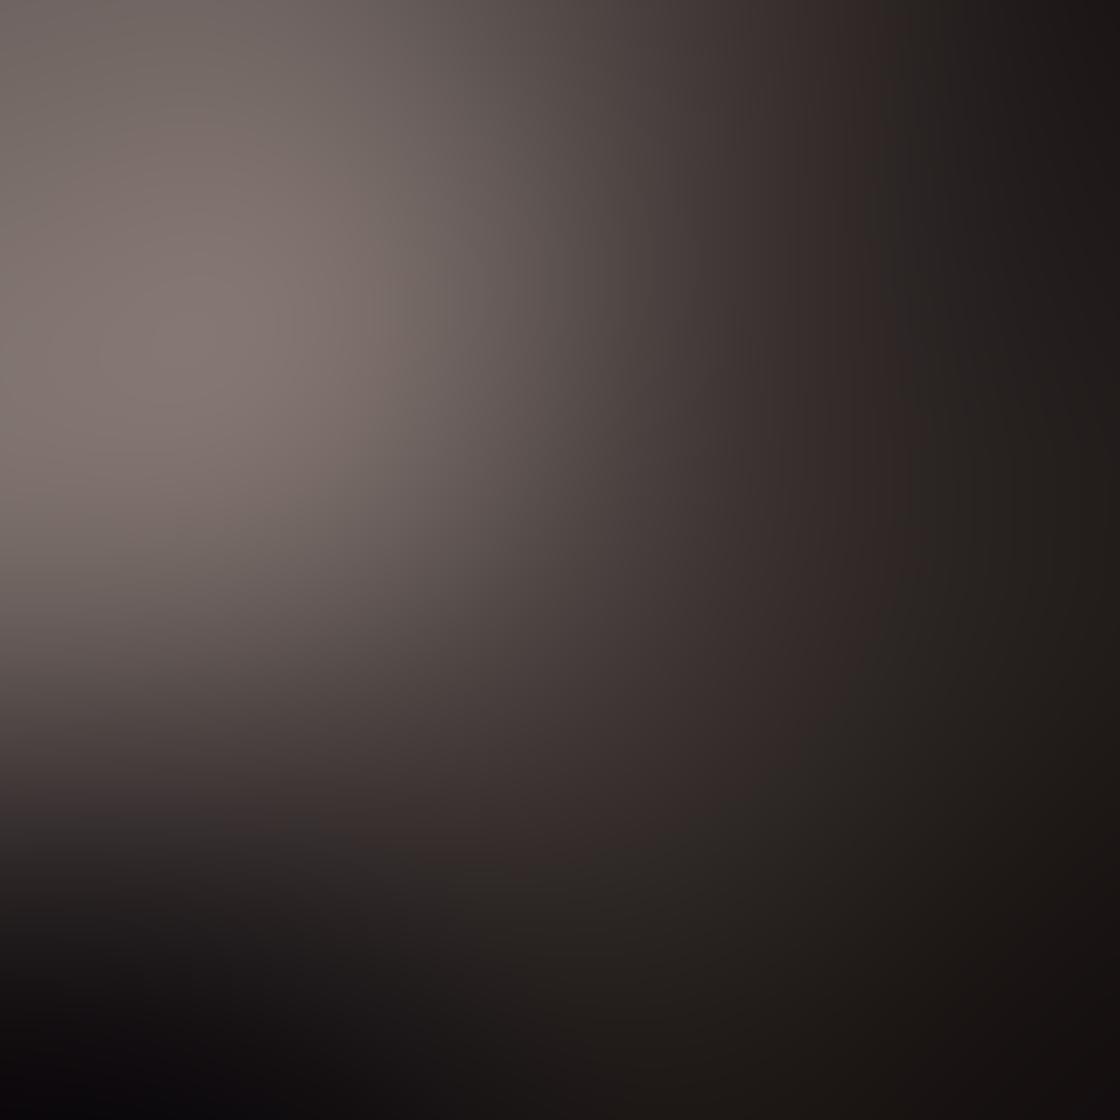 iPhone Photos Low Angle 2